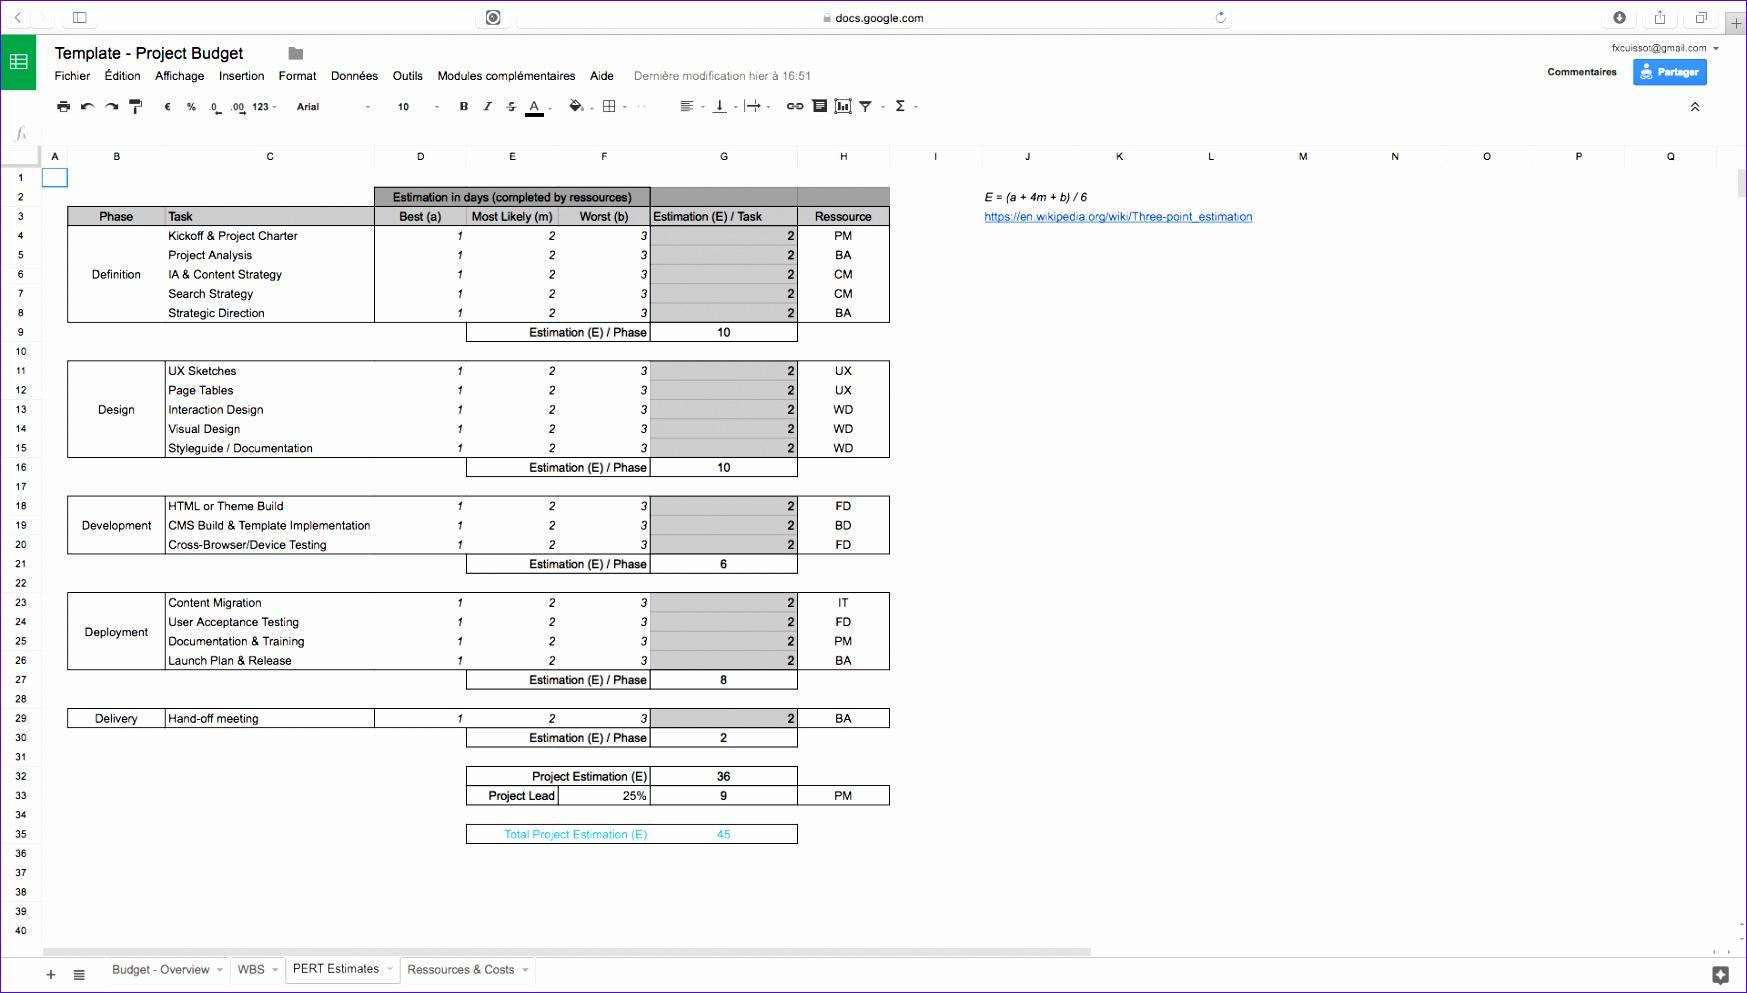 Project bud PERT estimates